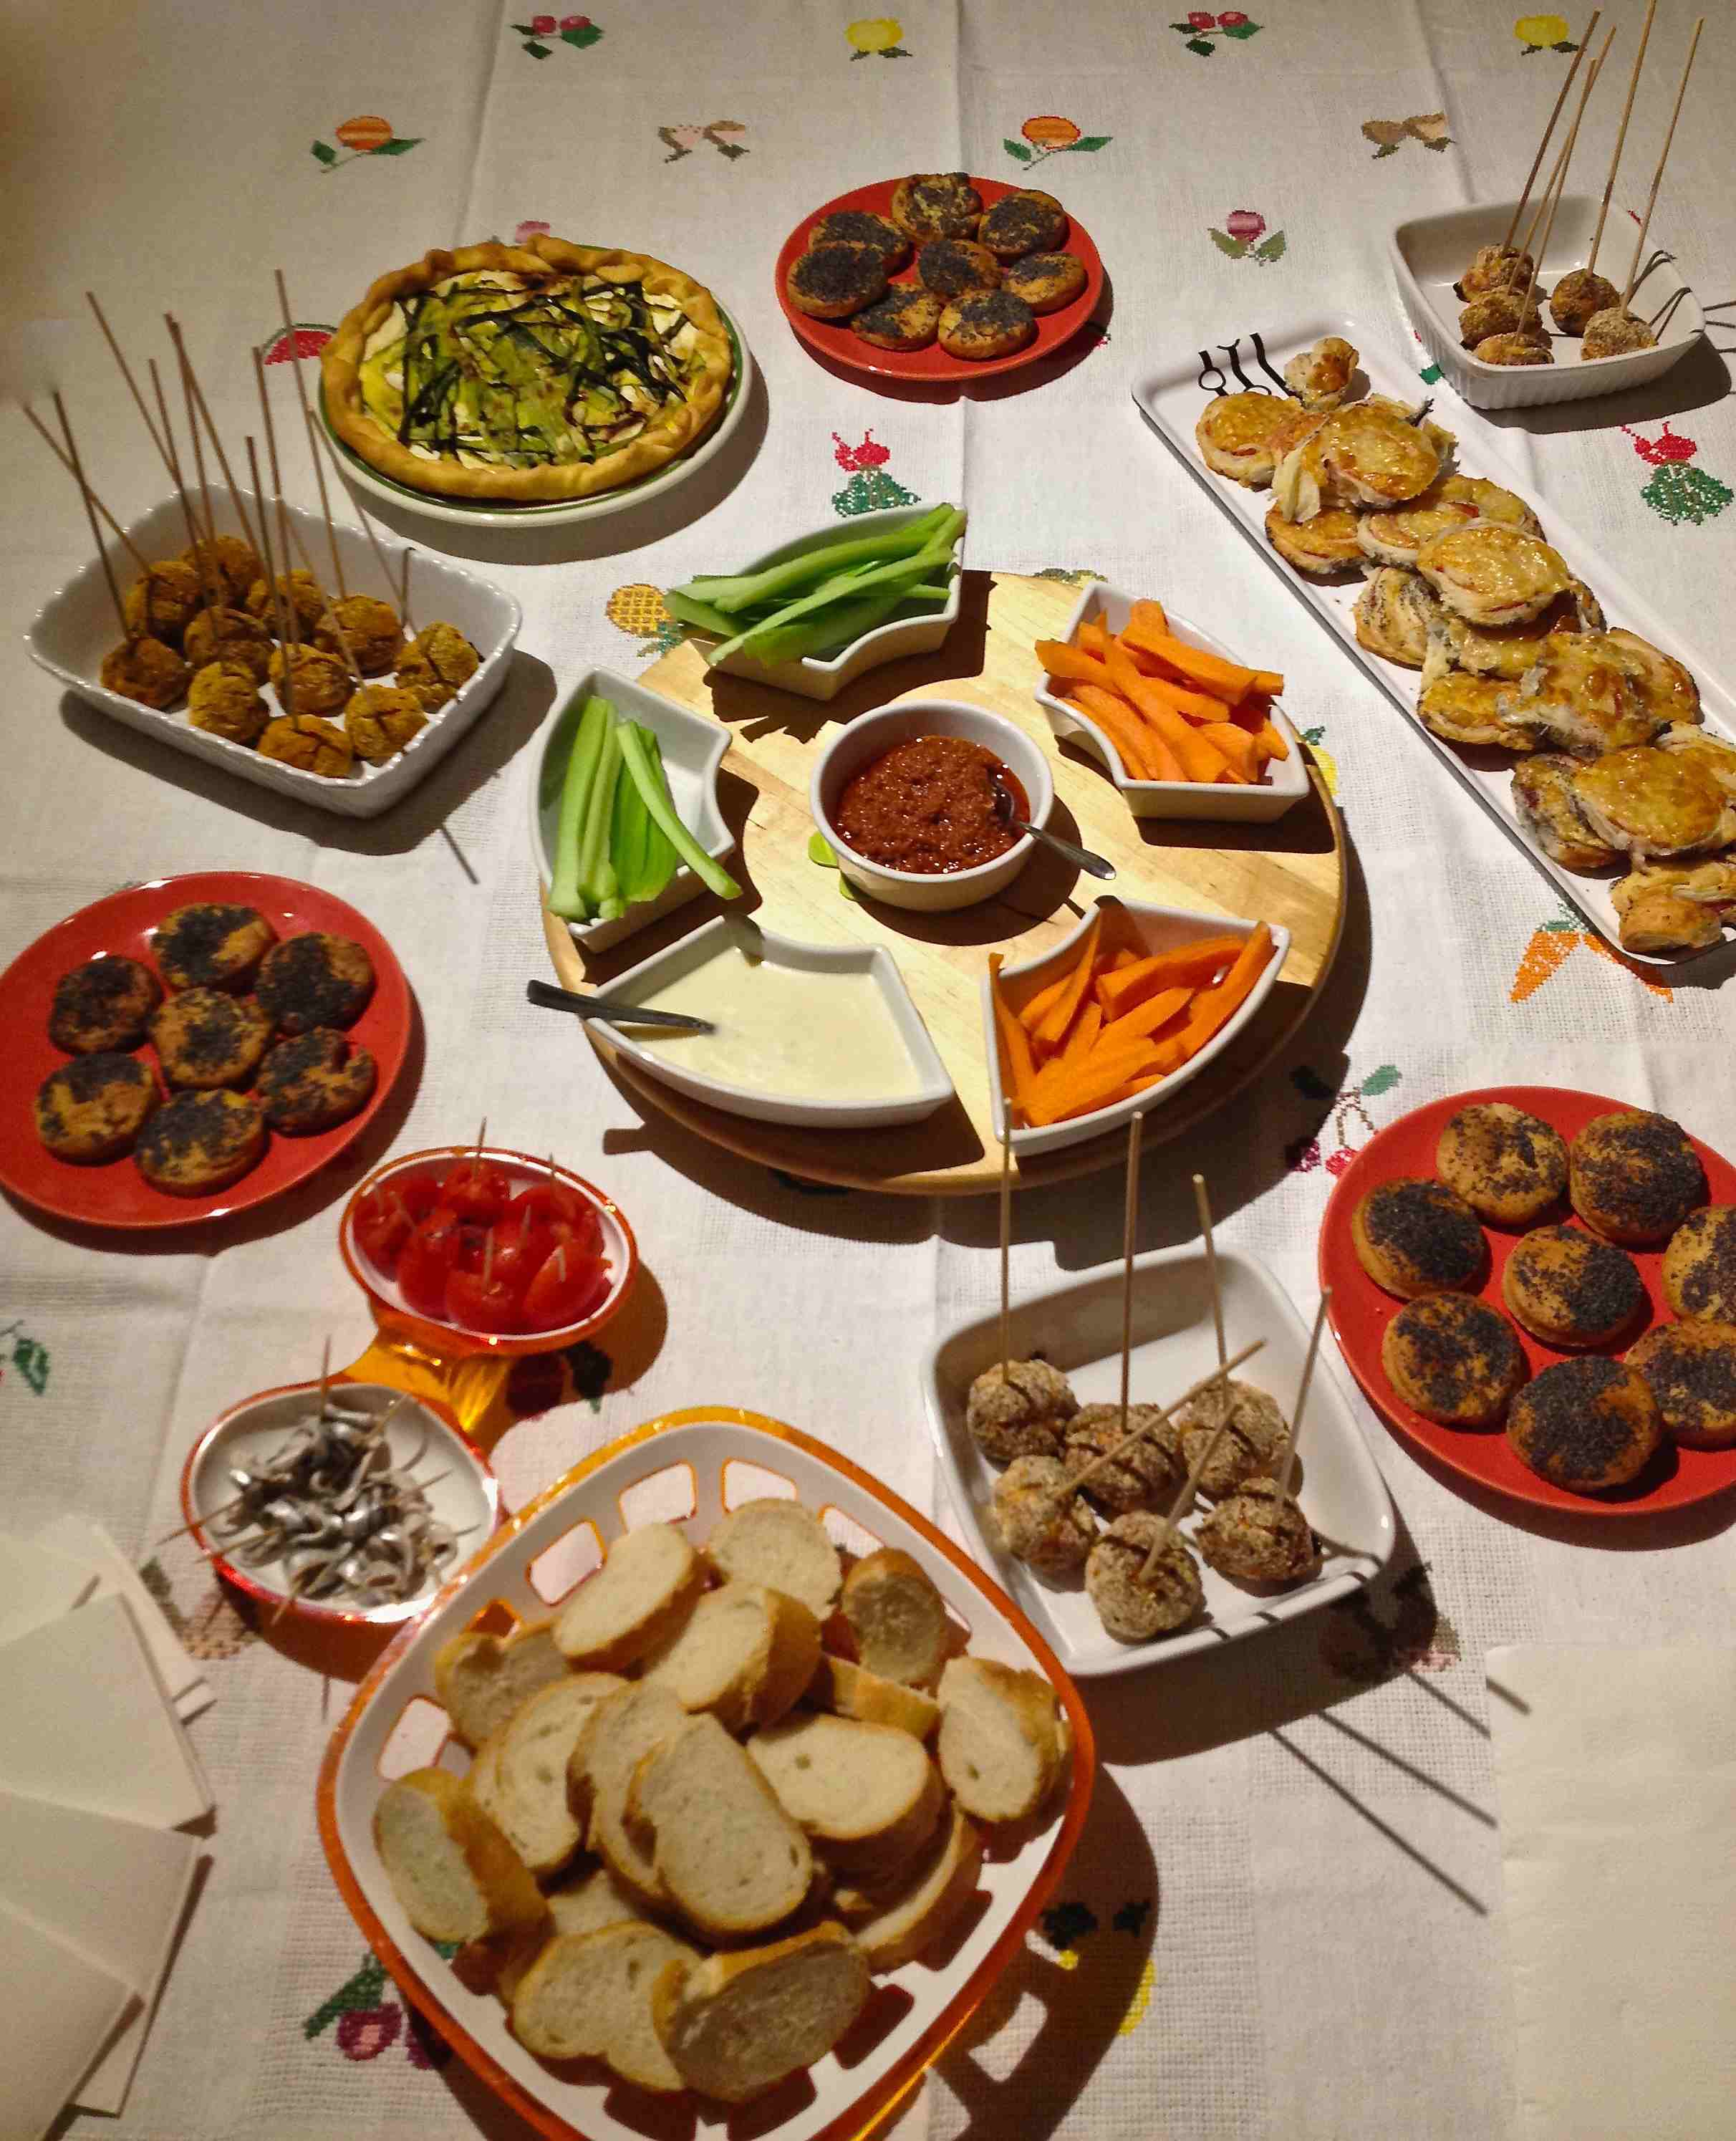 Conosciuto Organizzare un buffet (ed uscirne vivi) - Mamme in Cucina e Dintorni JD87